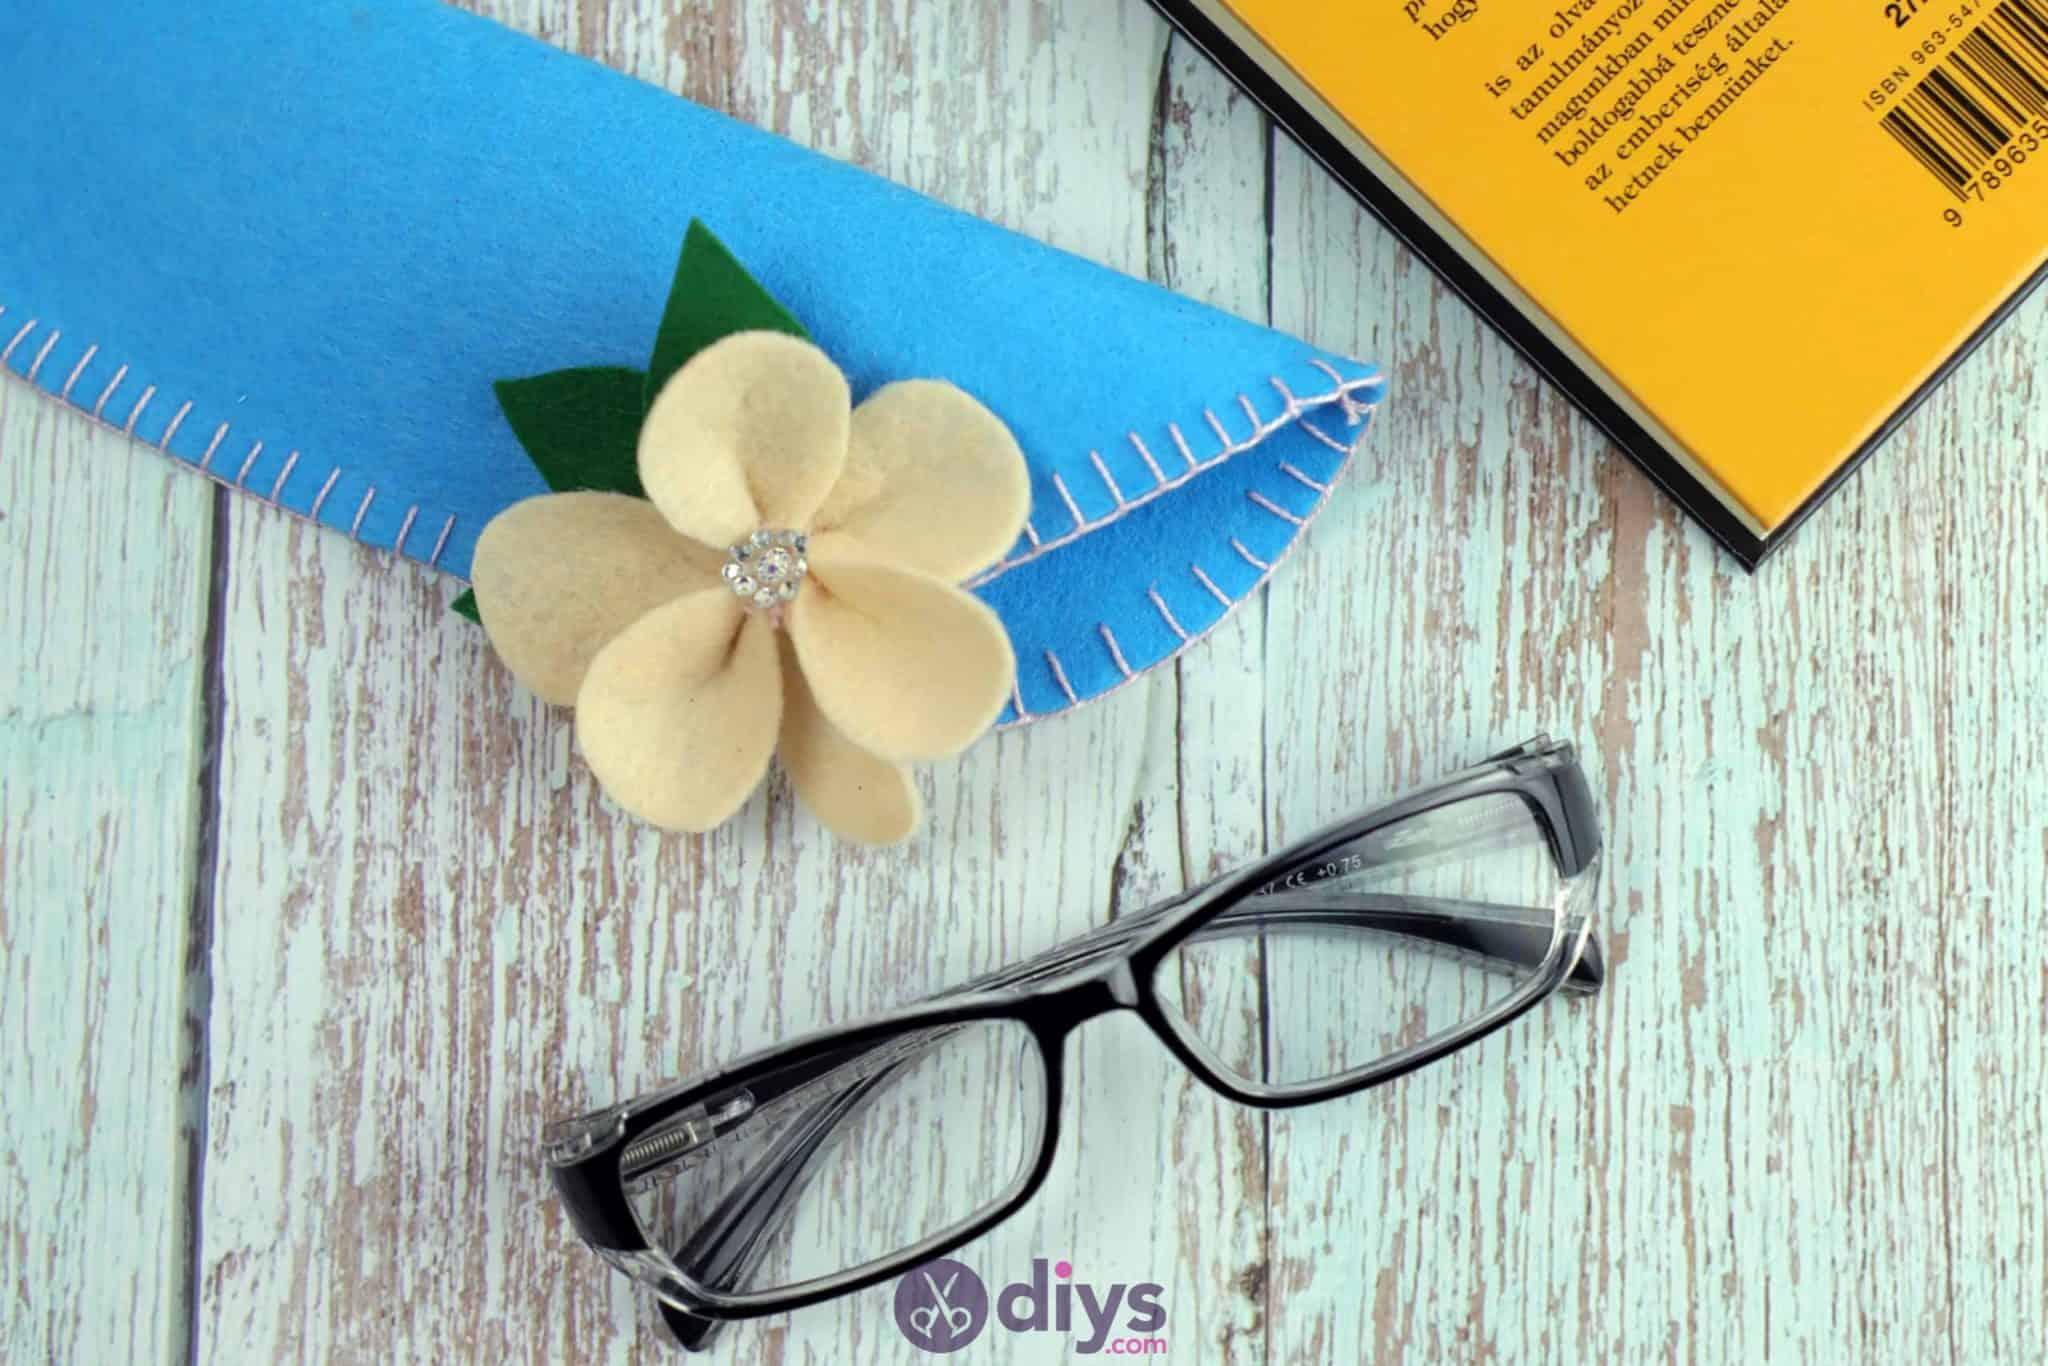 Diy simple felt glasses case